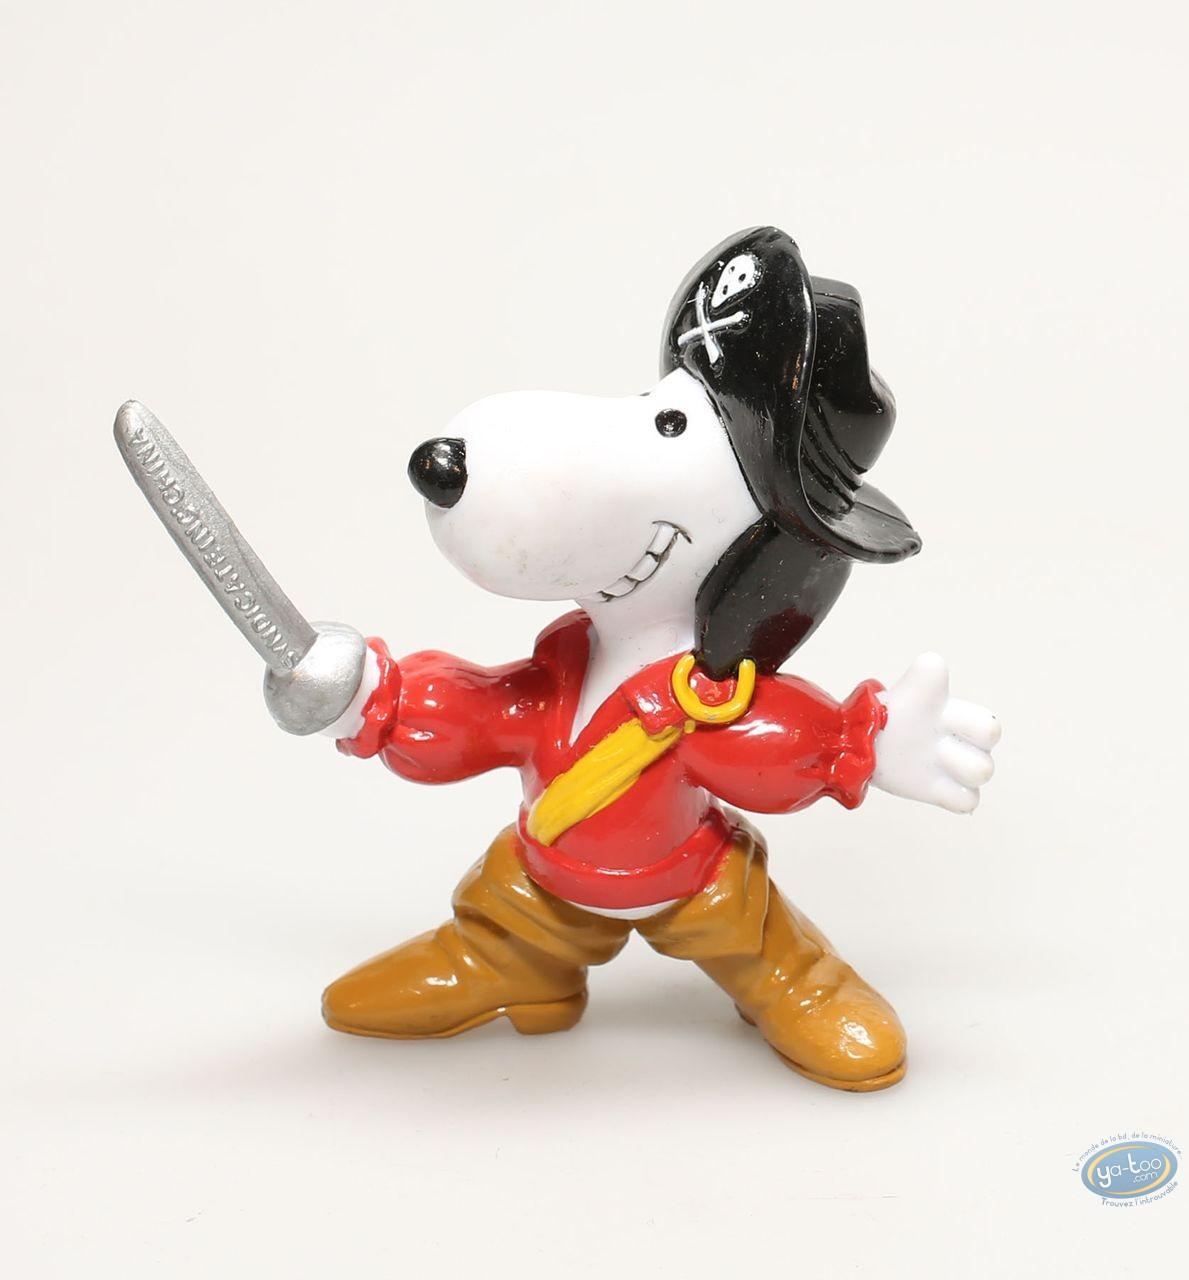 Figurine plastique, Snoopy : Snoopy corsaire